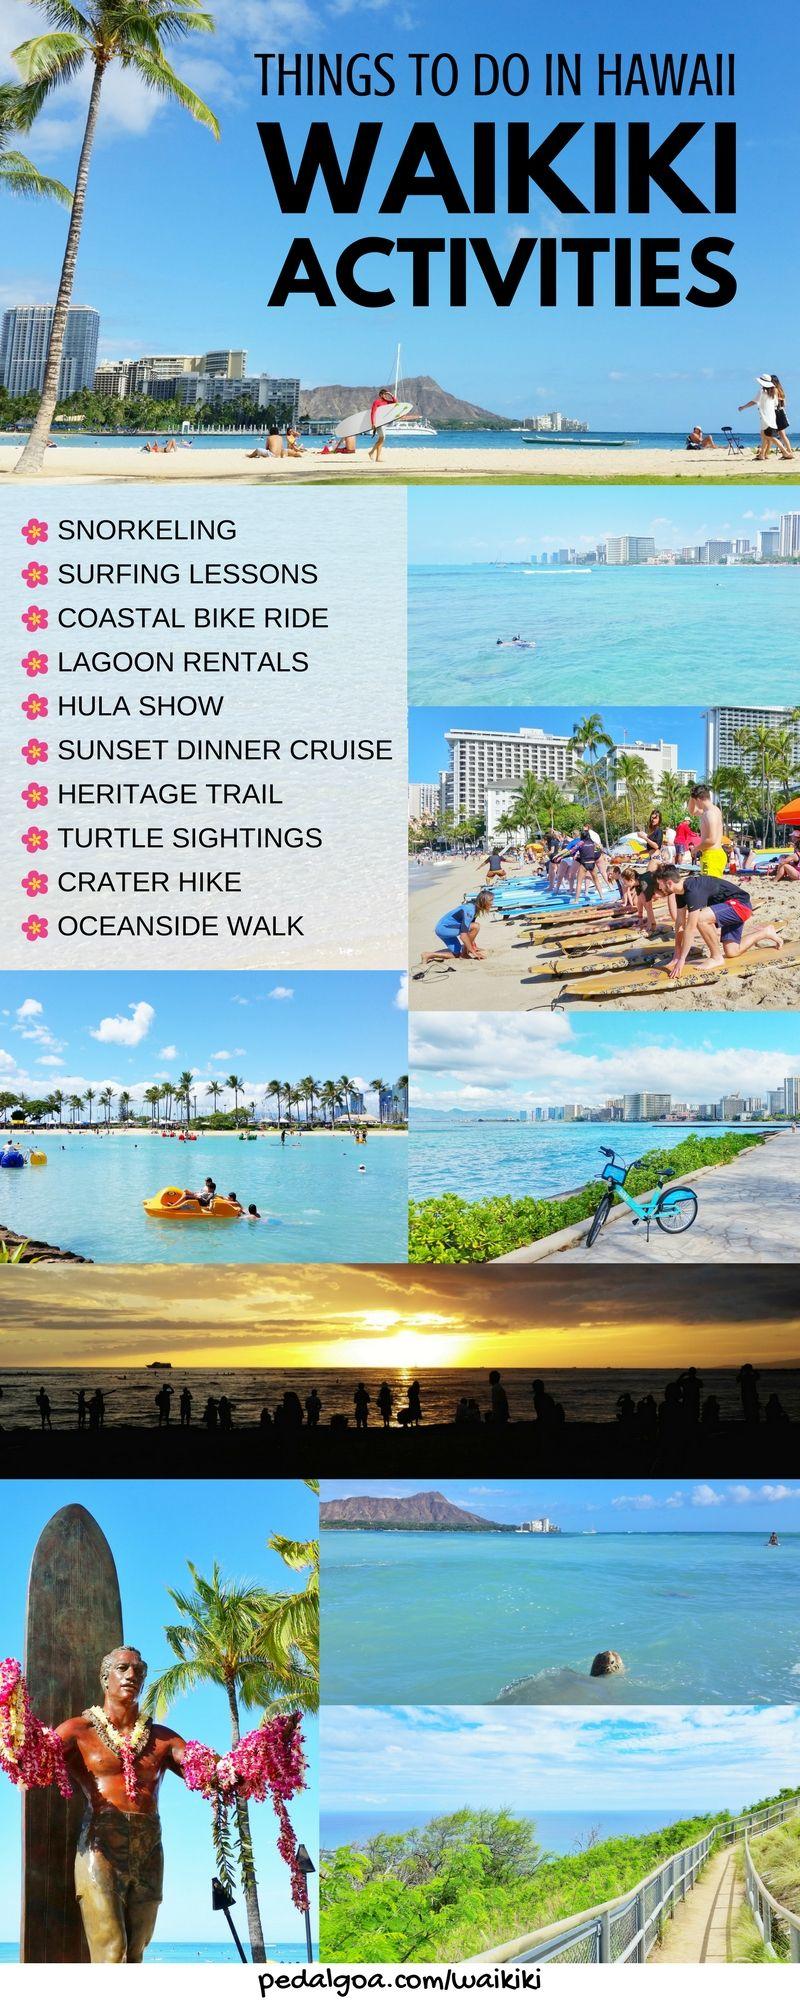 Waikiki Activities Travel Guide In